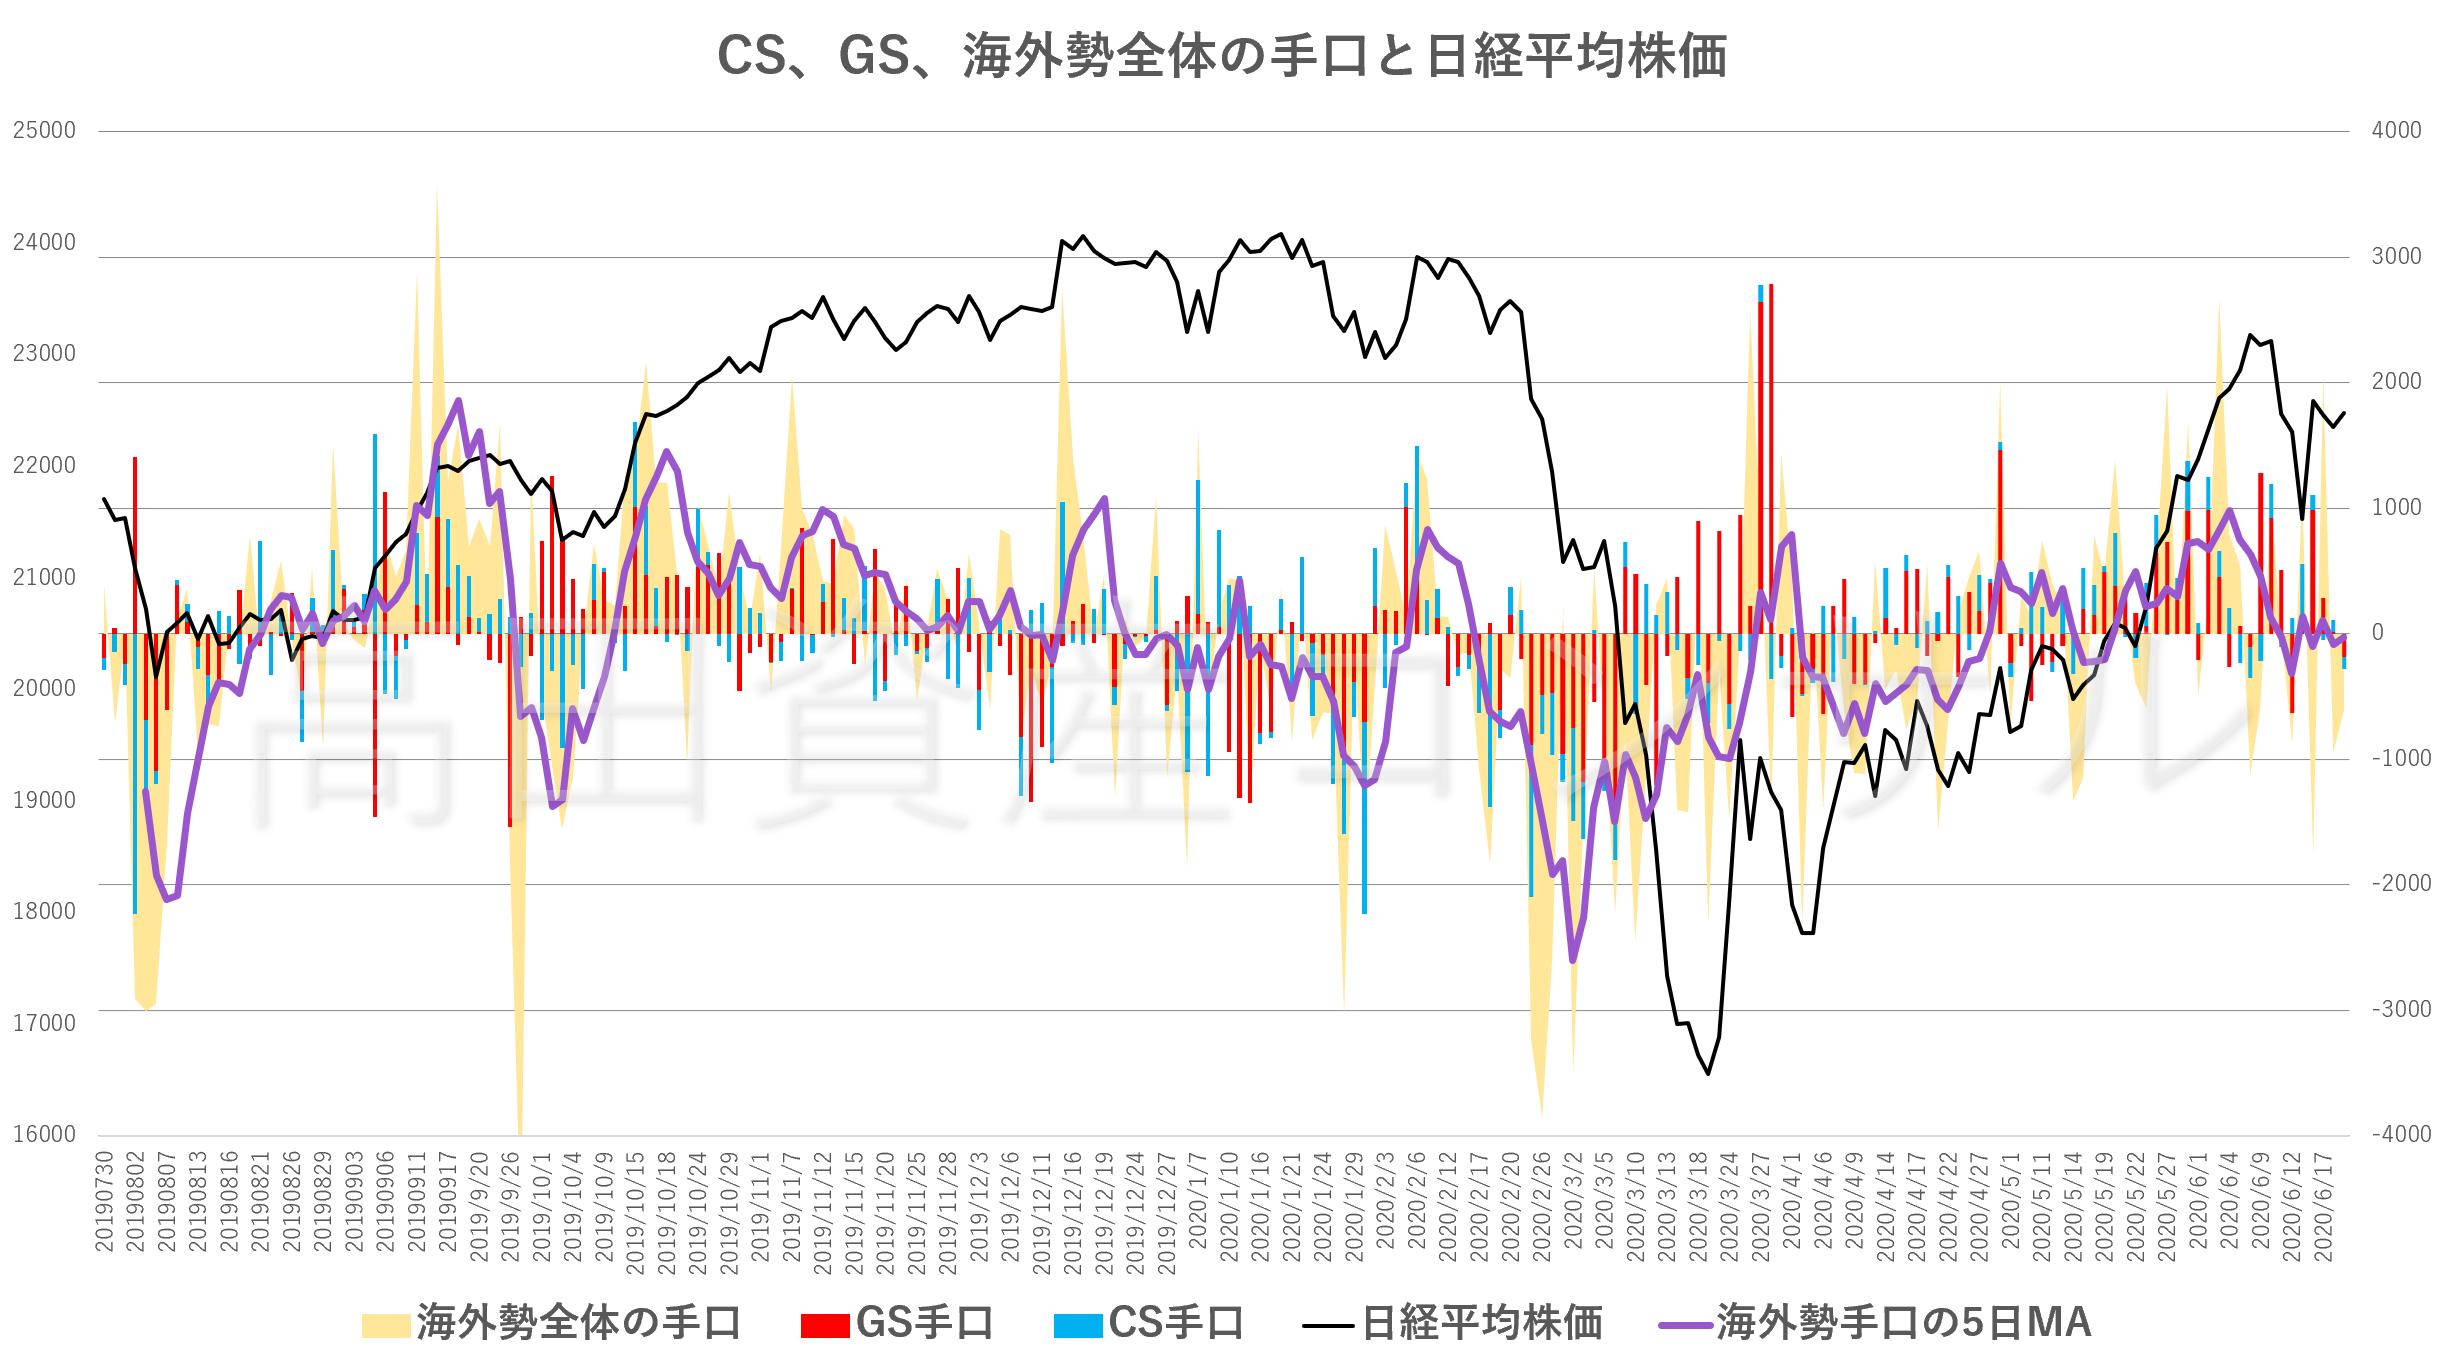 CS、GS、海外勢全体の手口と日経平均株価20200619